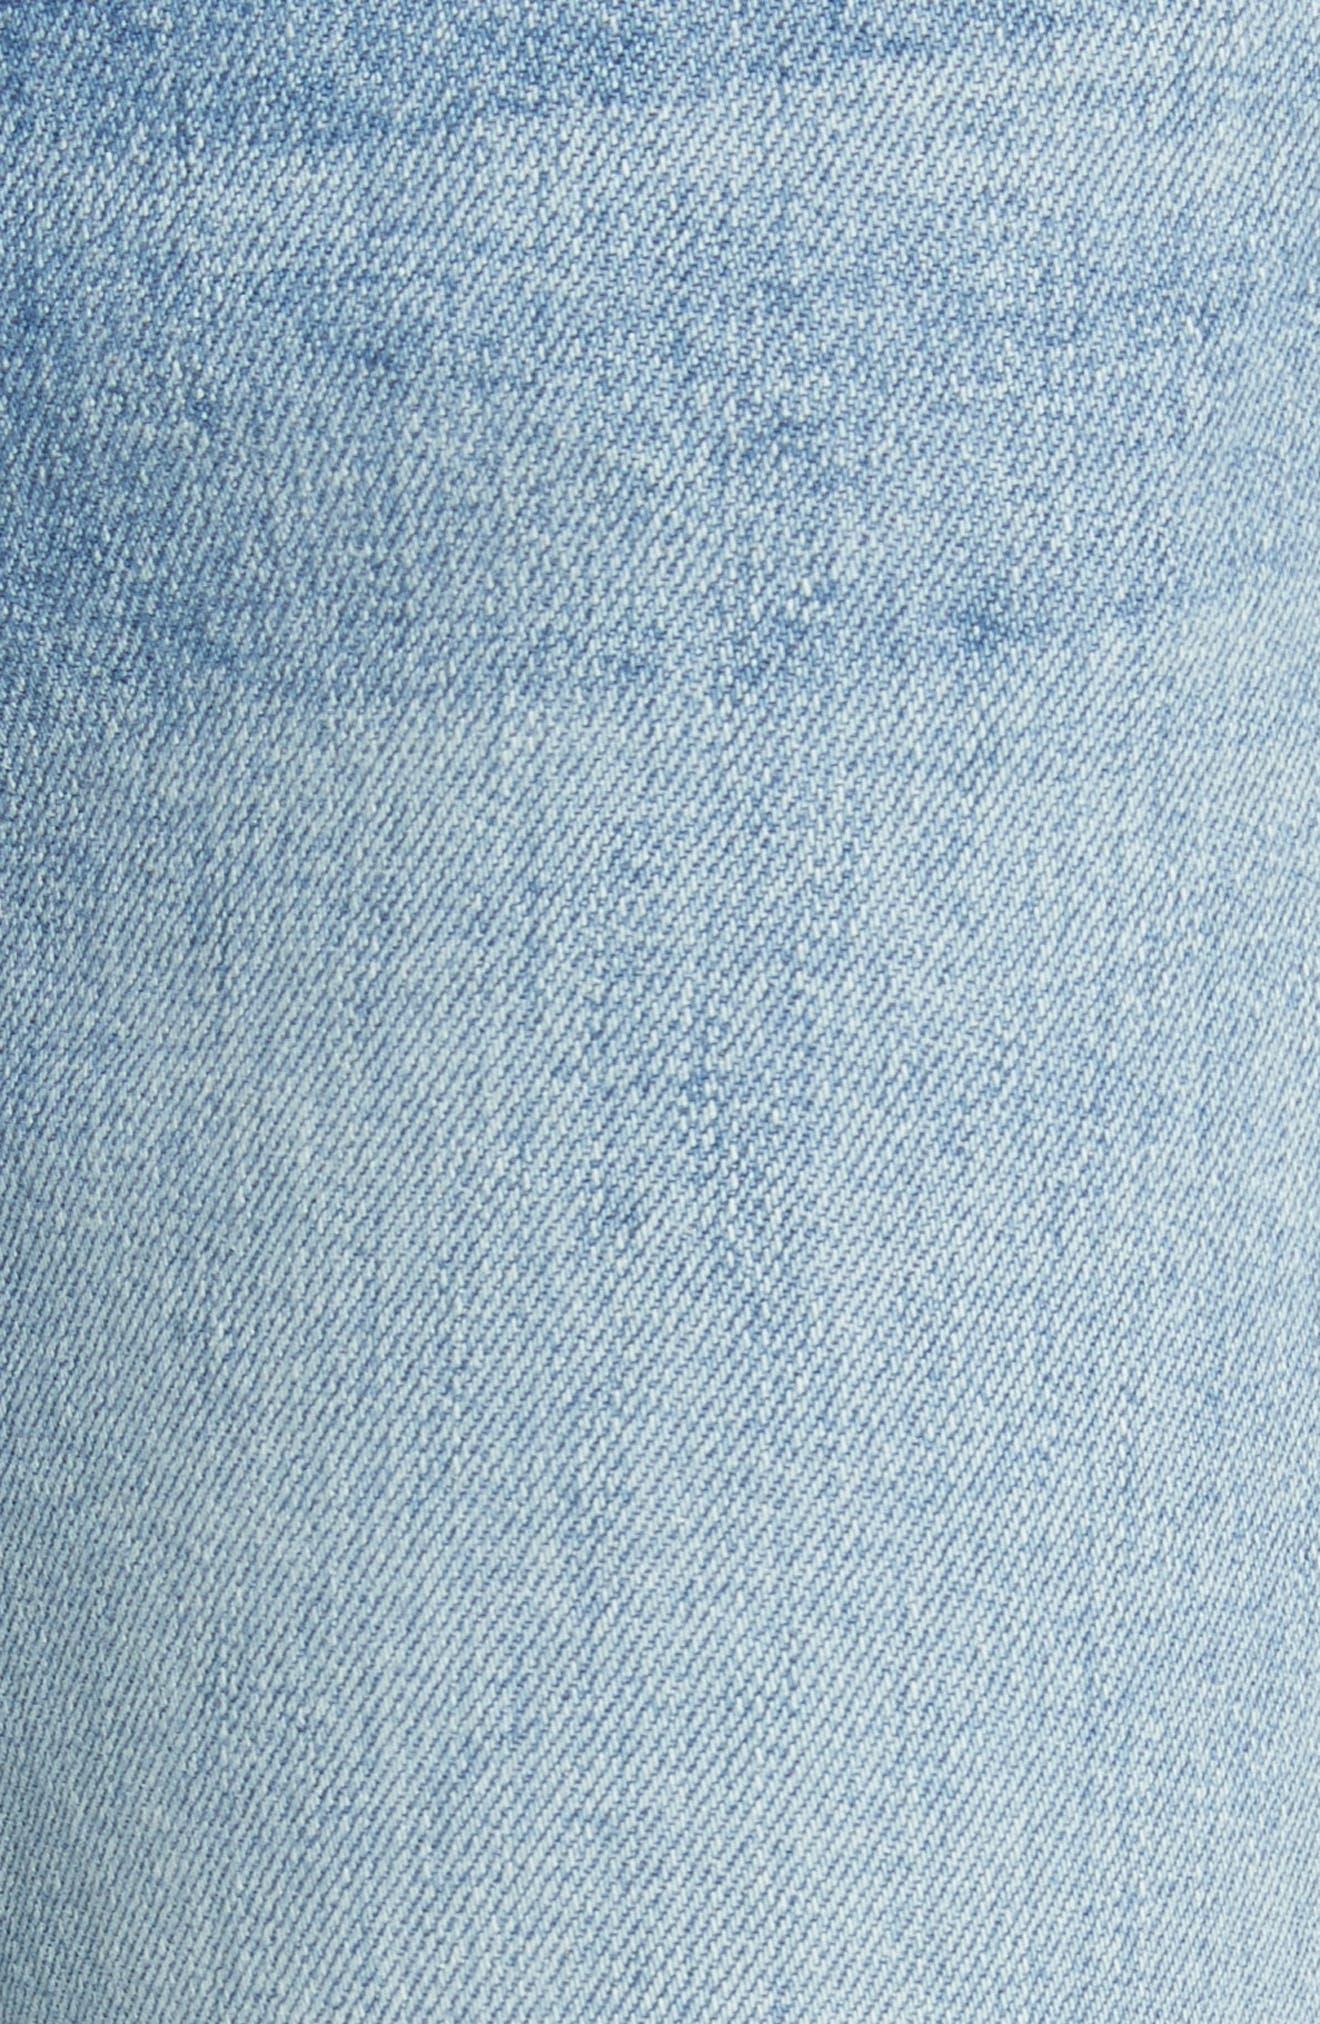 High Waist Crop Jeans,                             Alternate thumbnail 5, color,                             Dark Wash